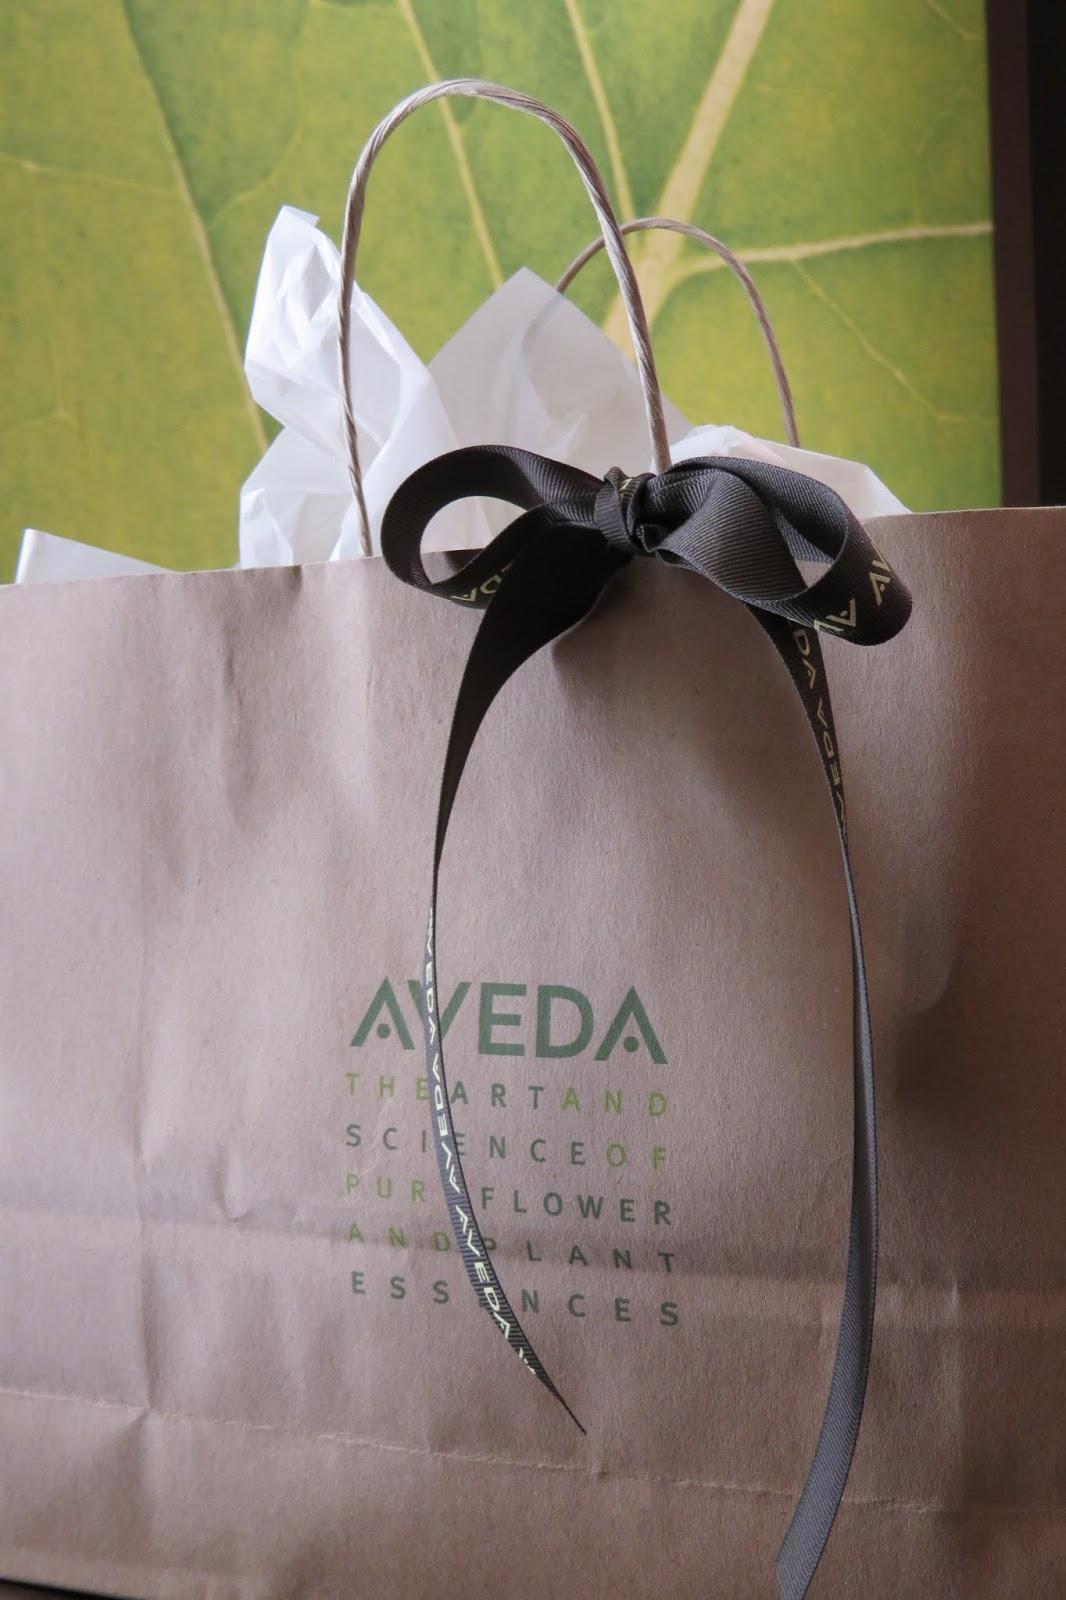 Aveda Experience Center